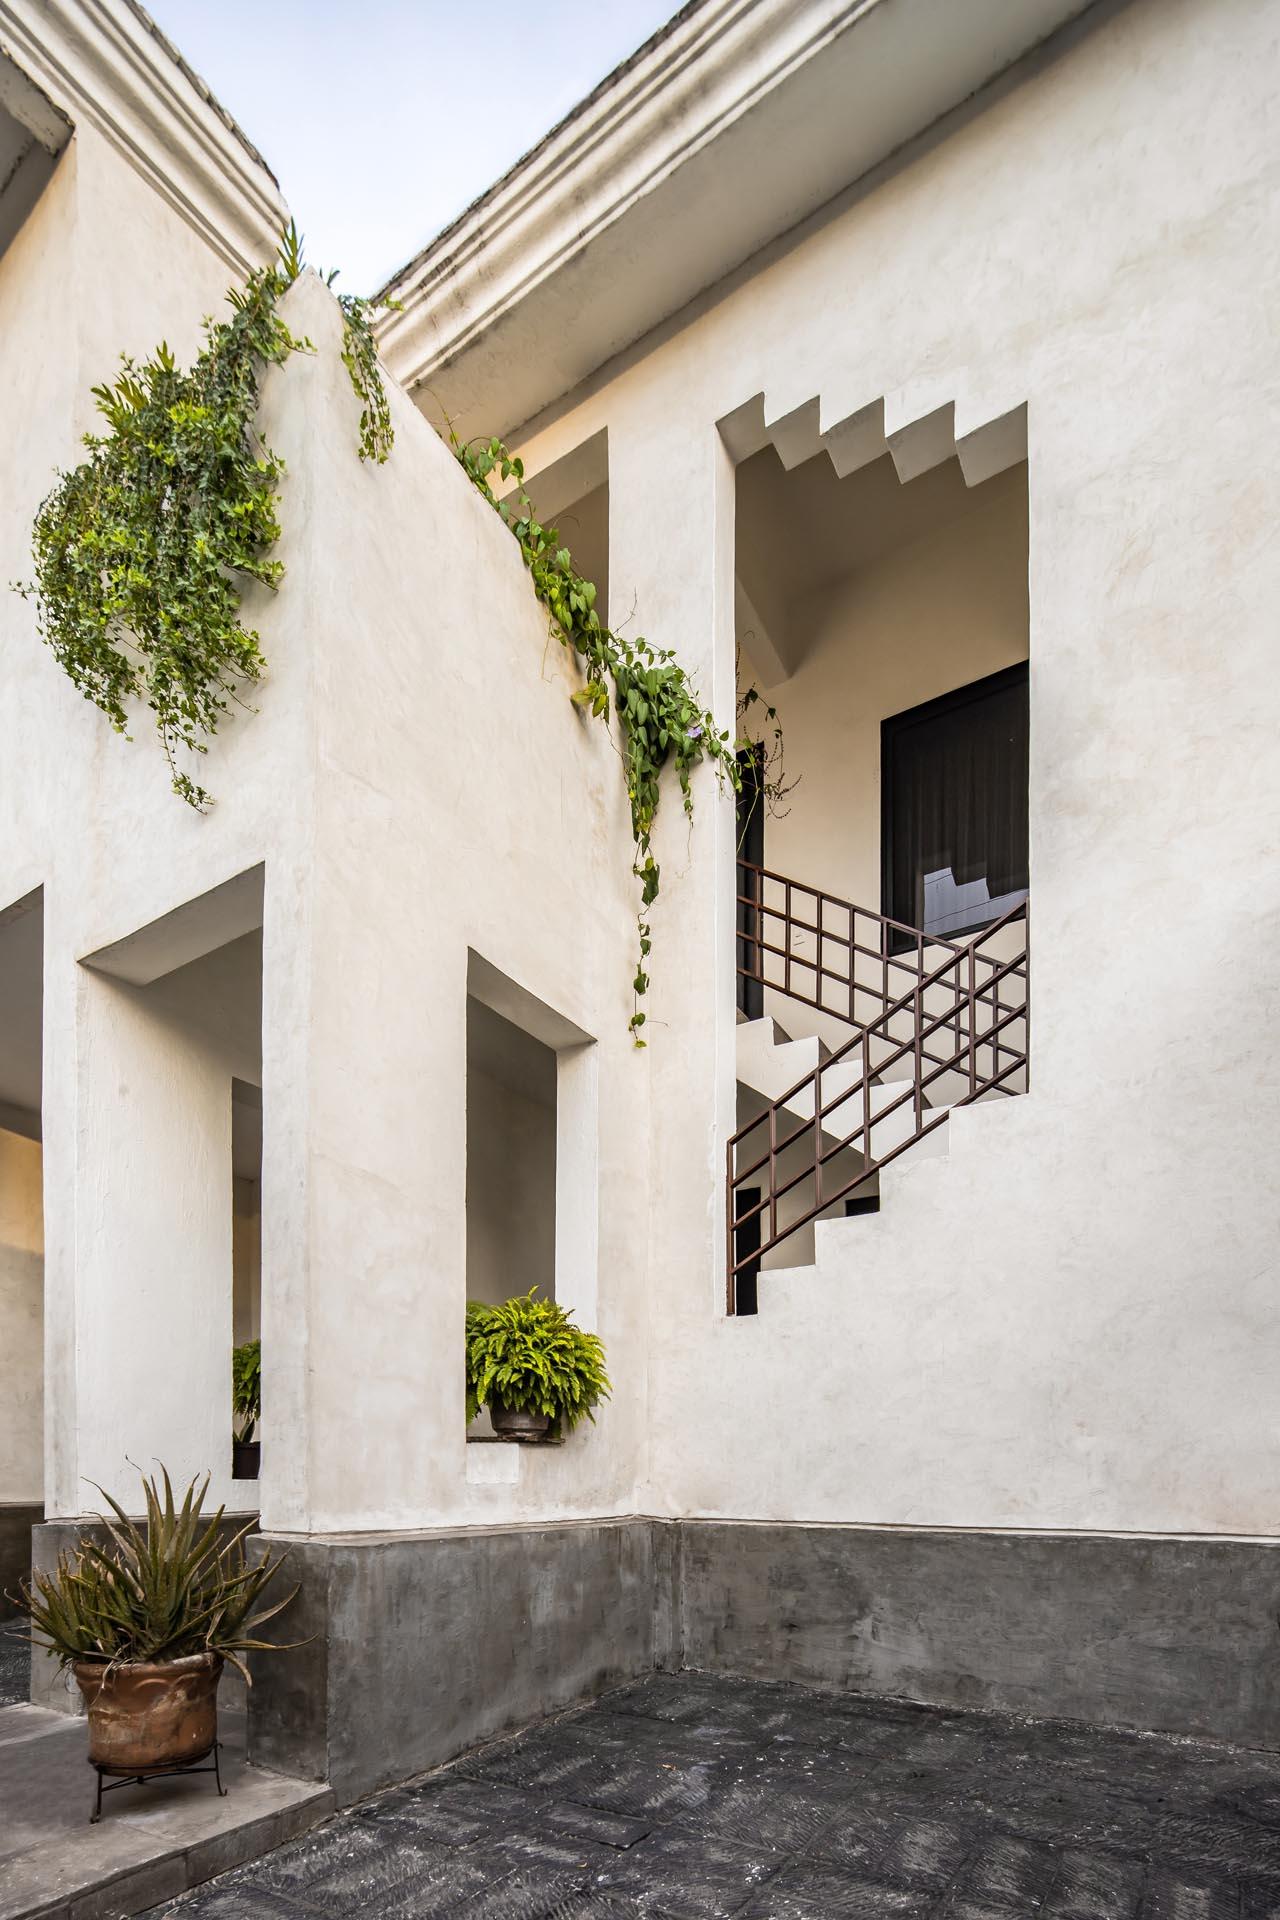 viviendas montes exterior